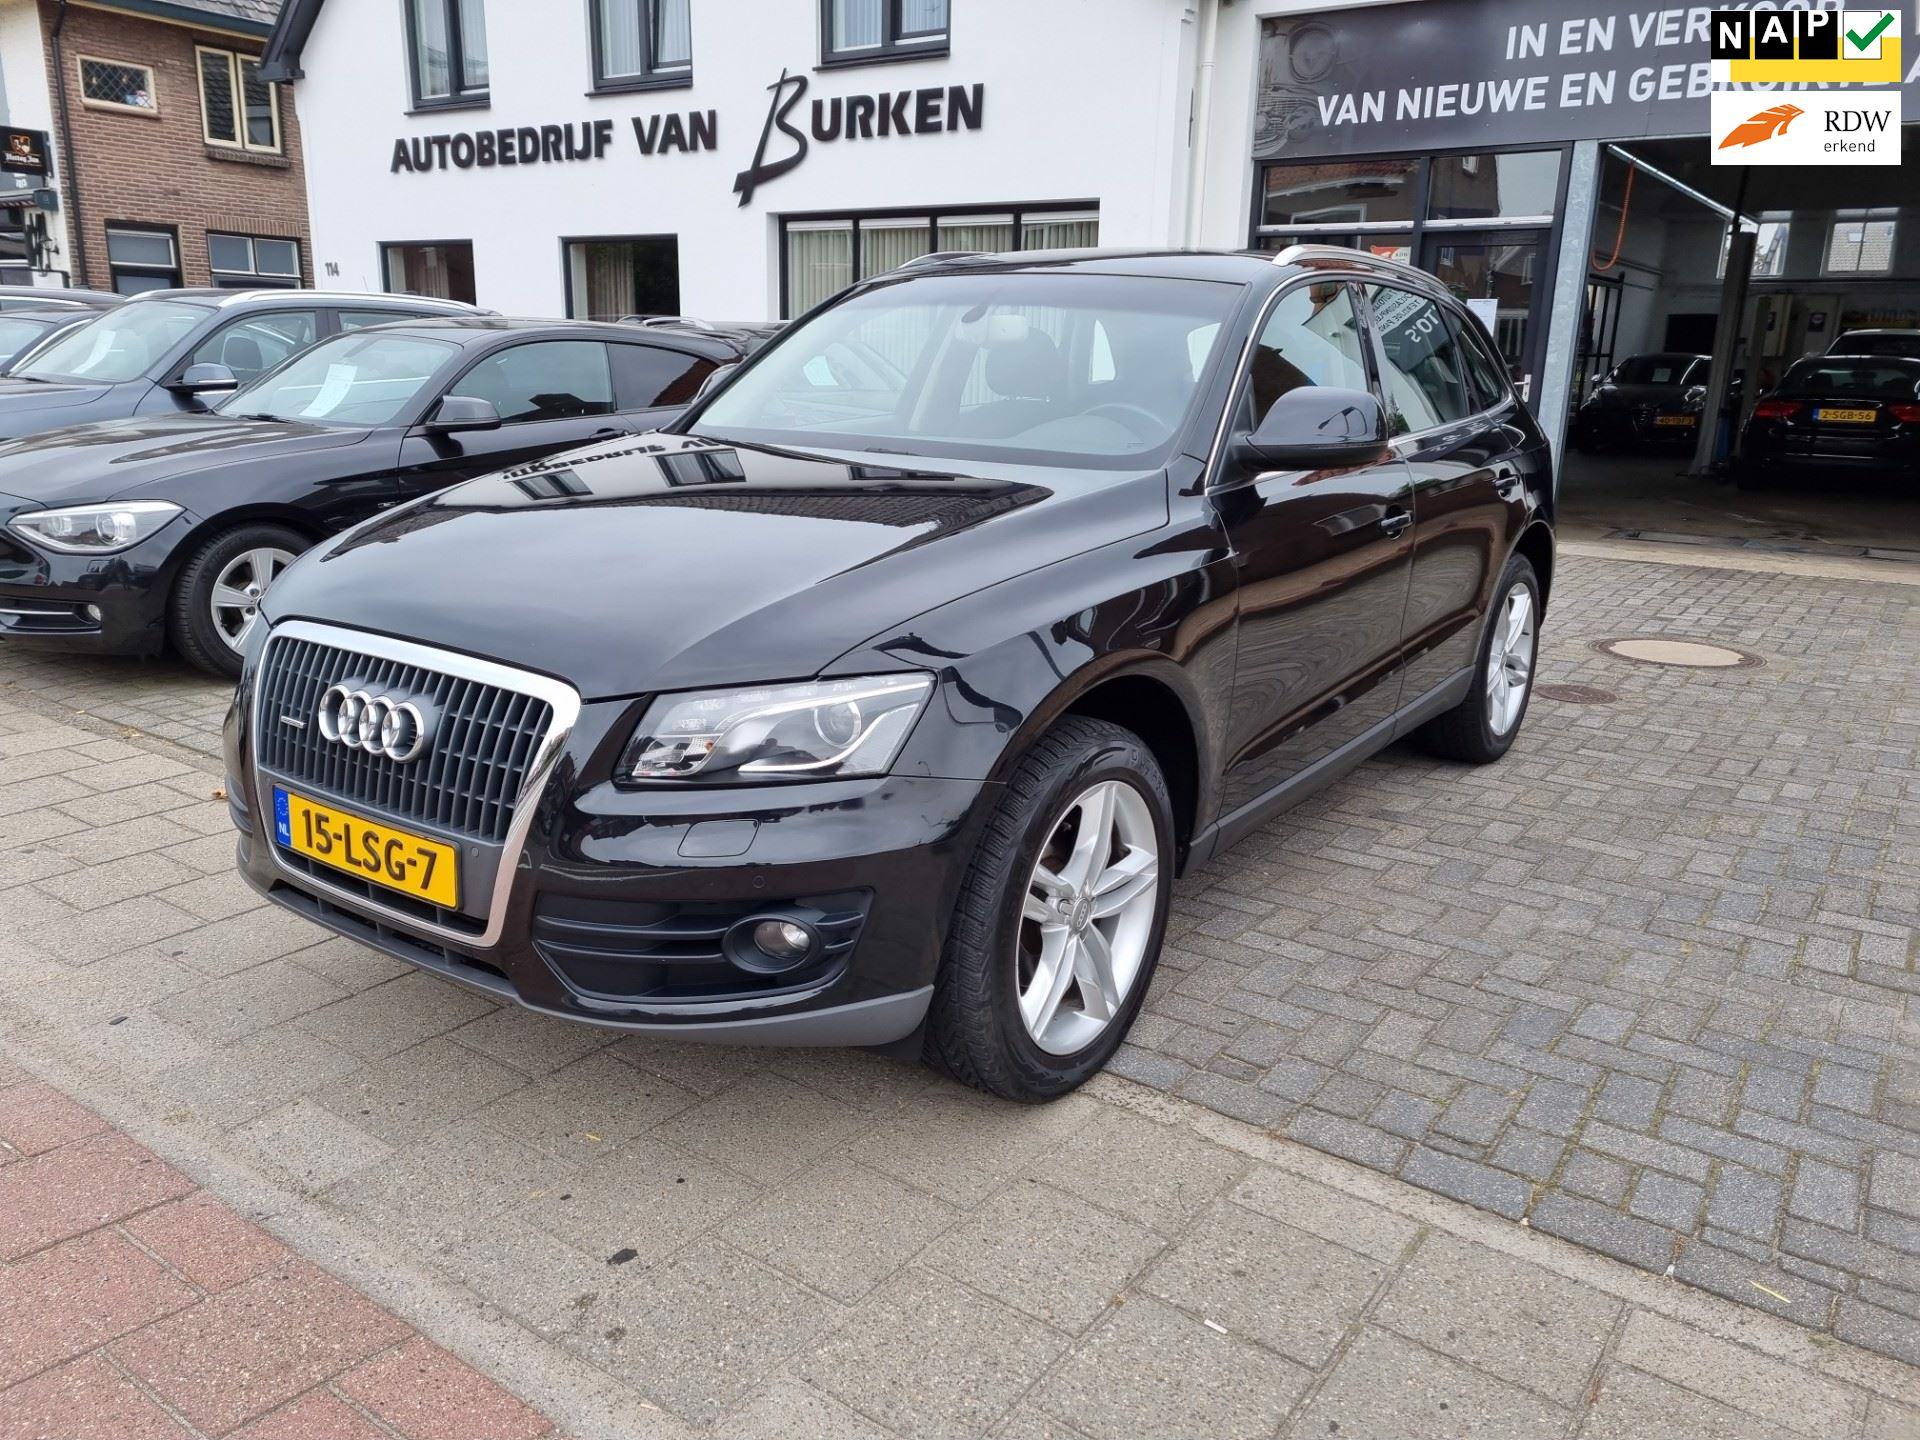 Audi Q5 occasion - Autobedrijf van Burken